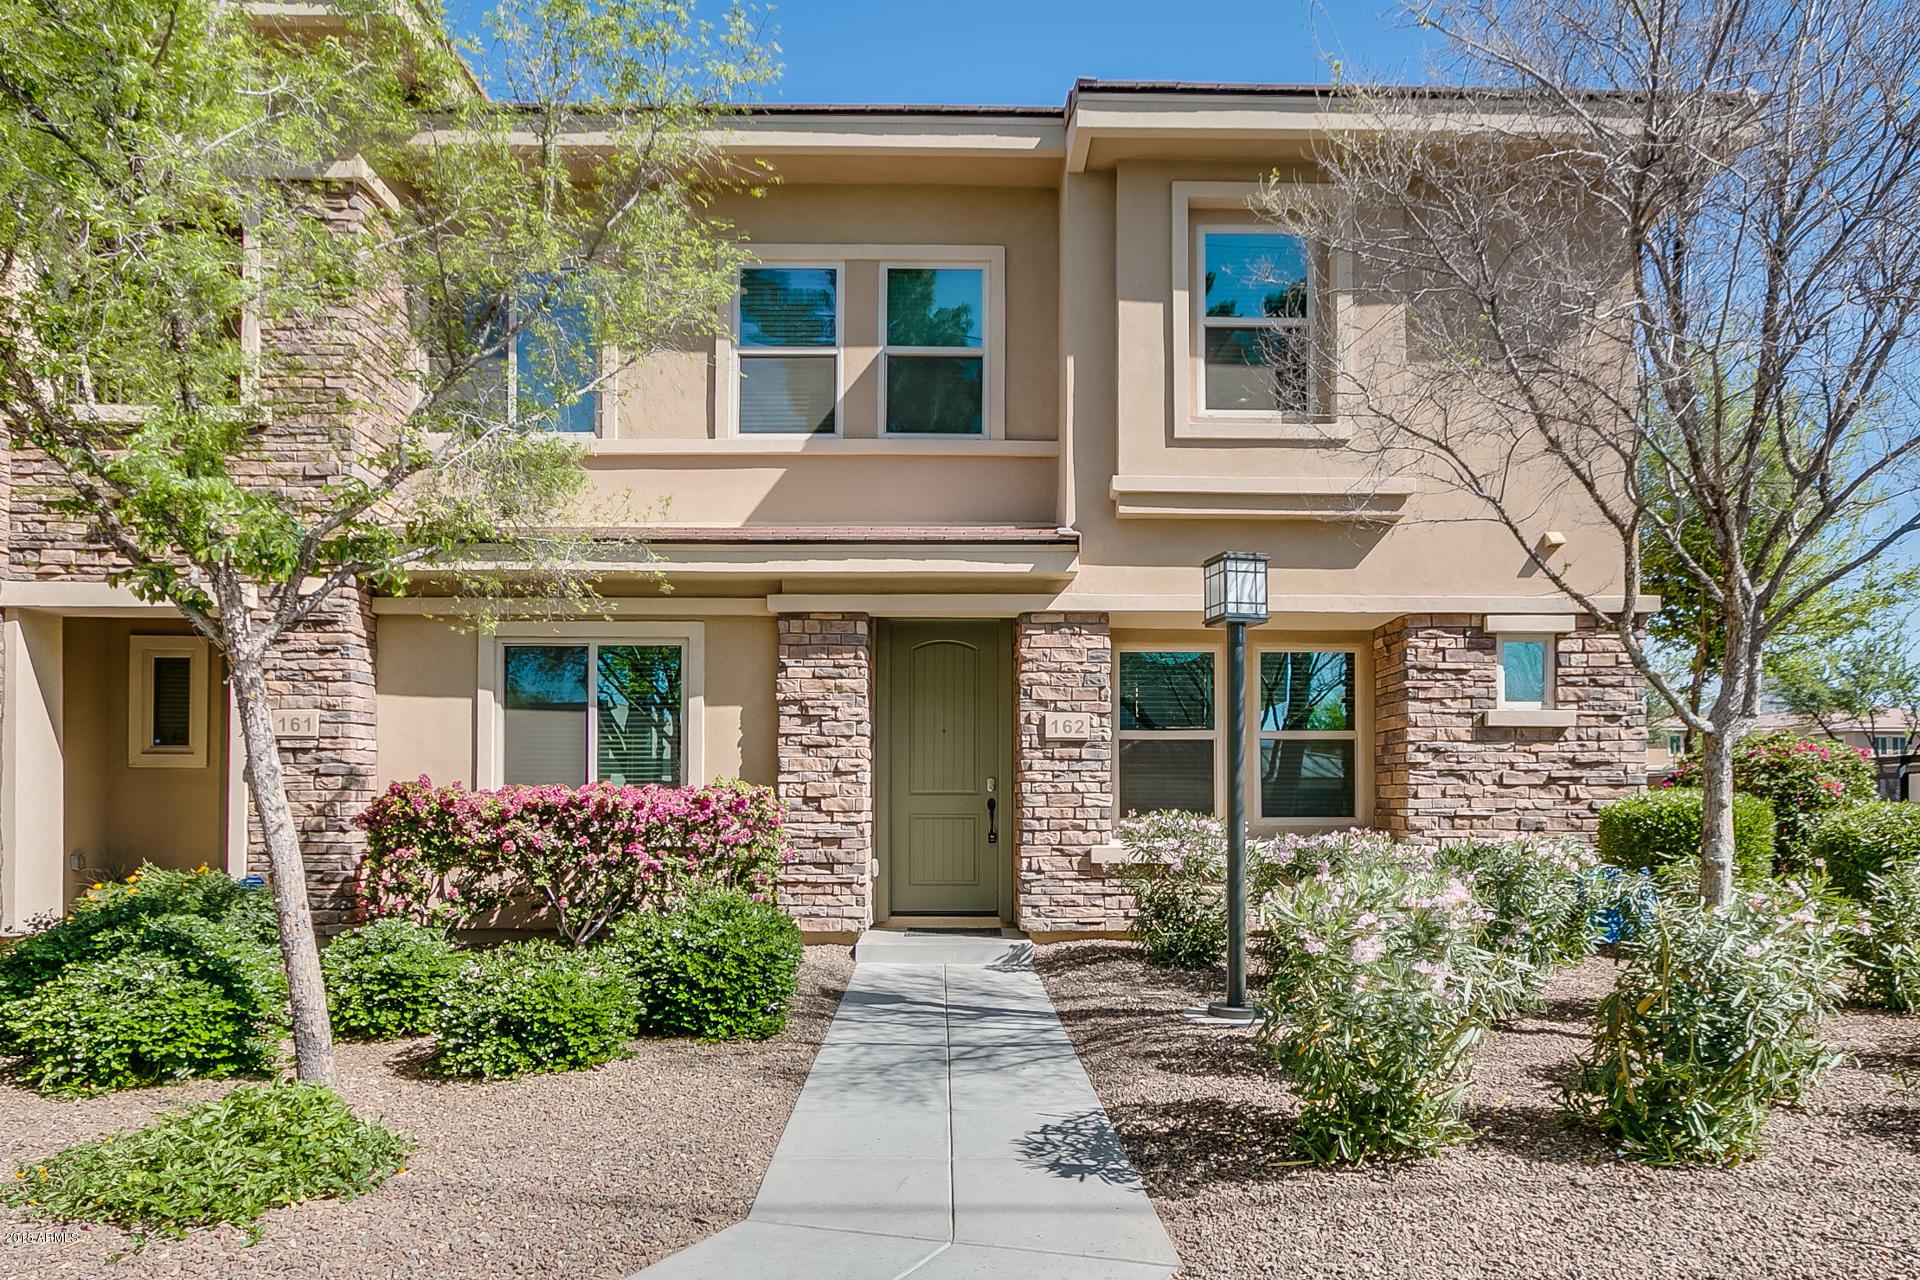 Photo of 5550 N 16TH Street #162, Phoenix, AZ 85016